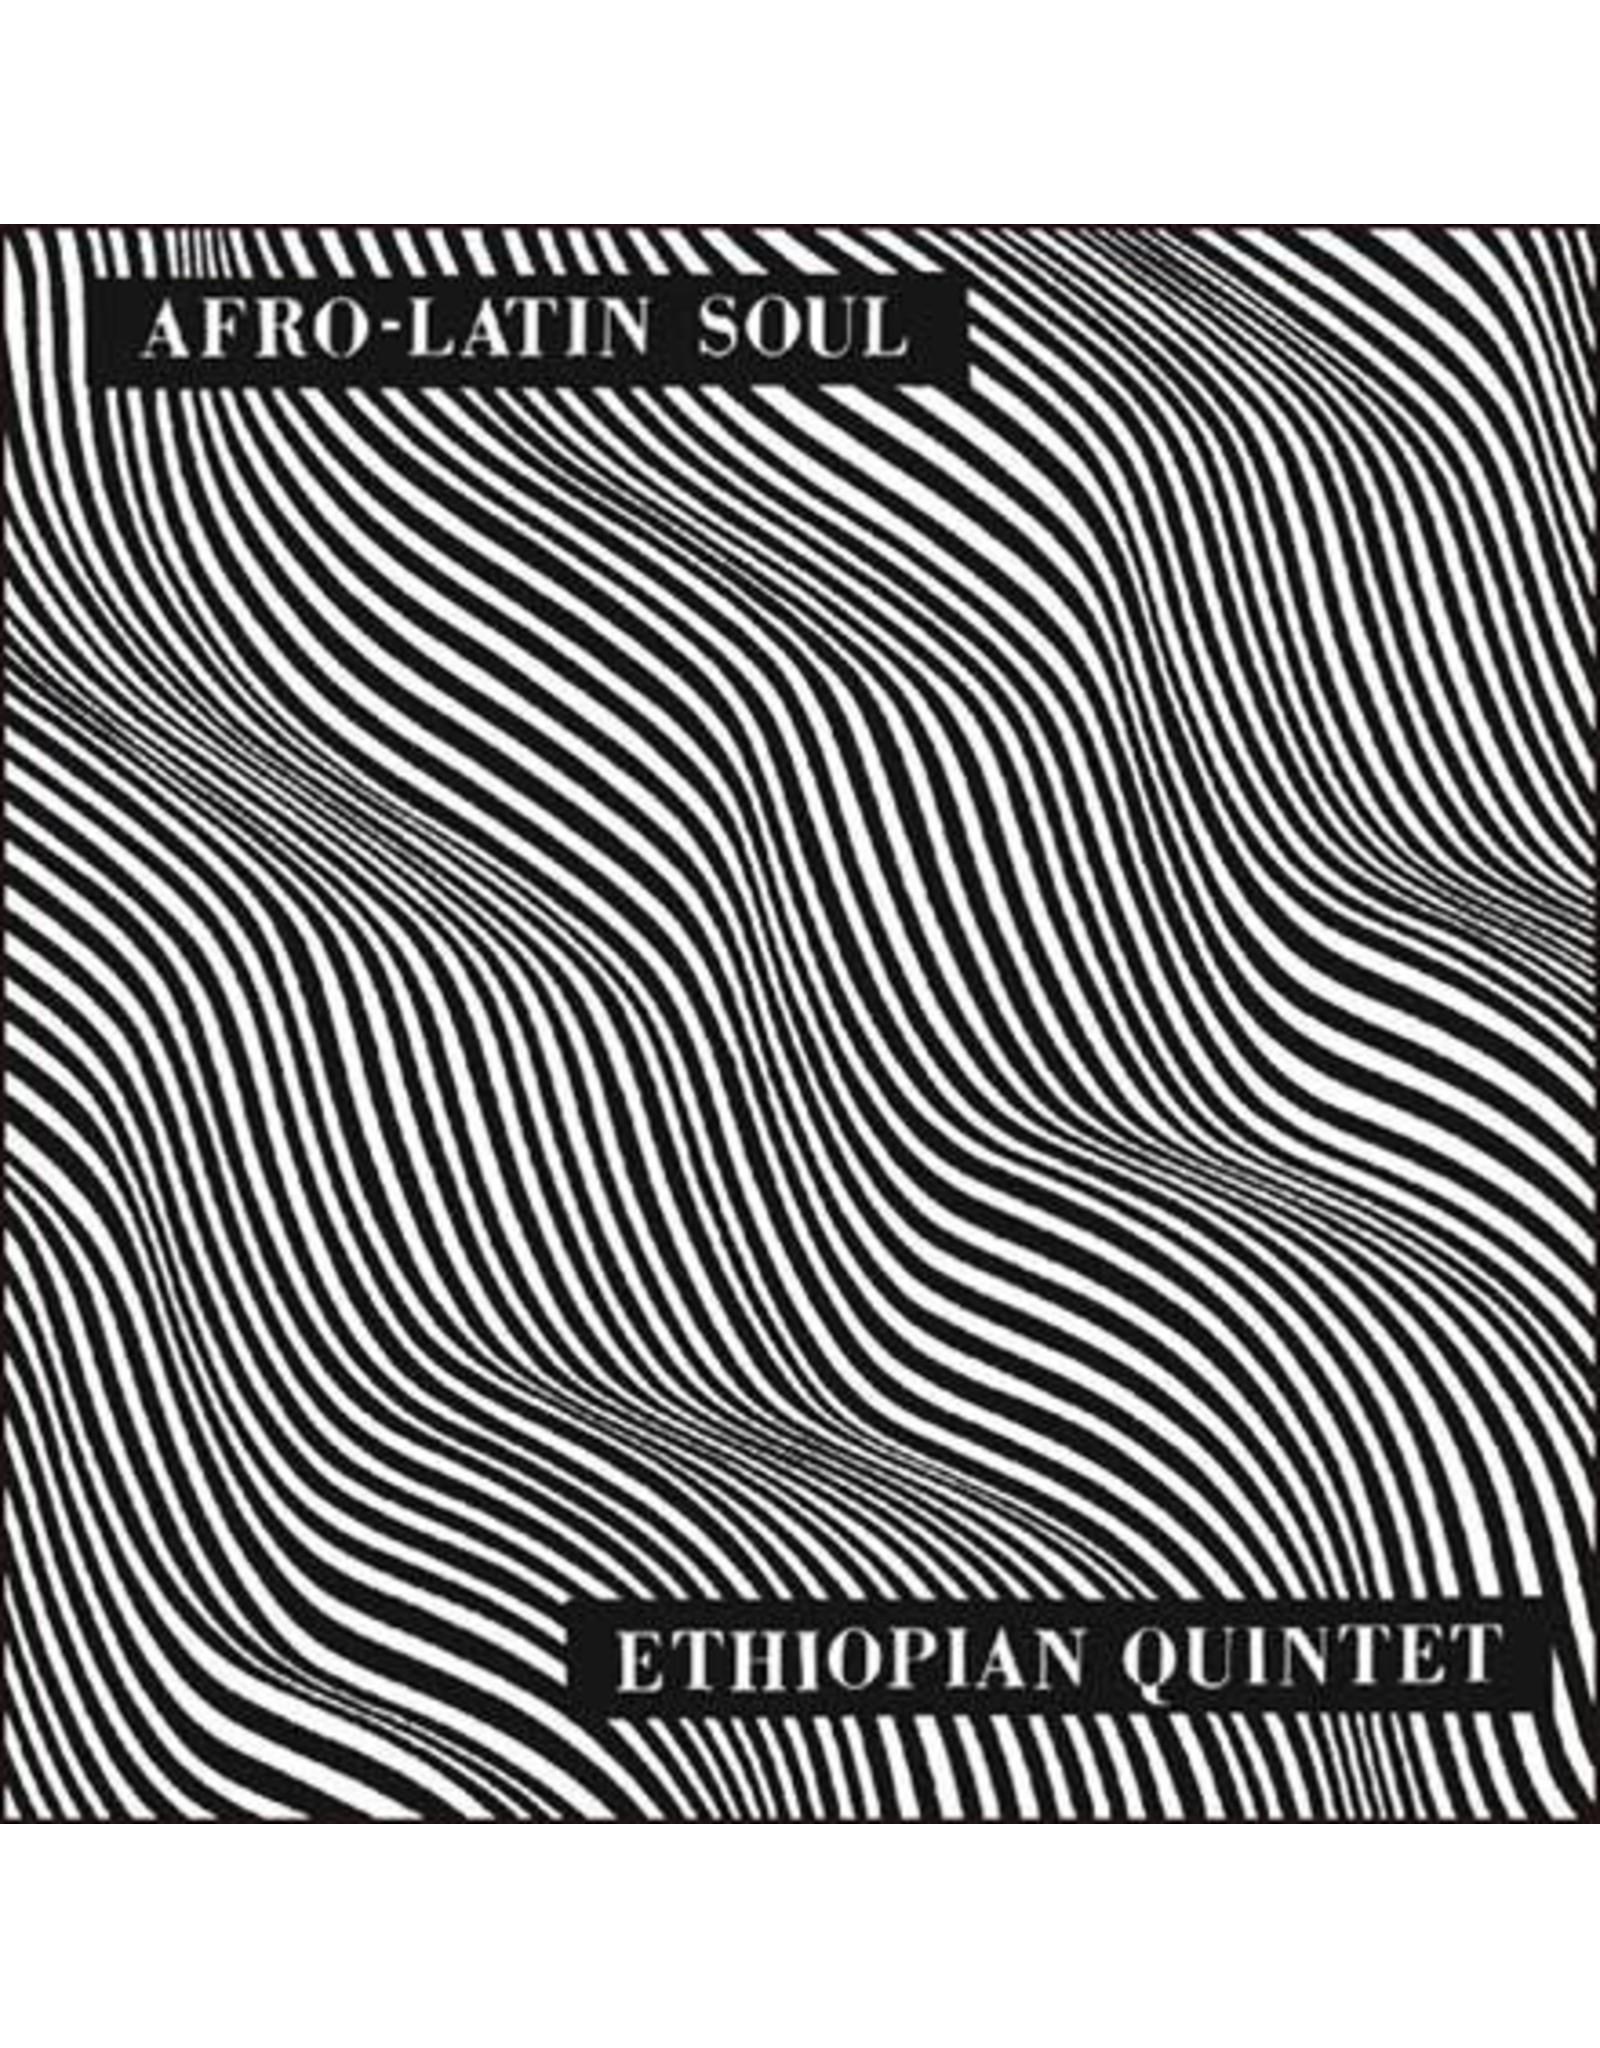 Strut Astatke, Mulatu: Afro Latin Soul Vols 1 LP